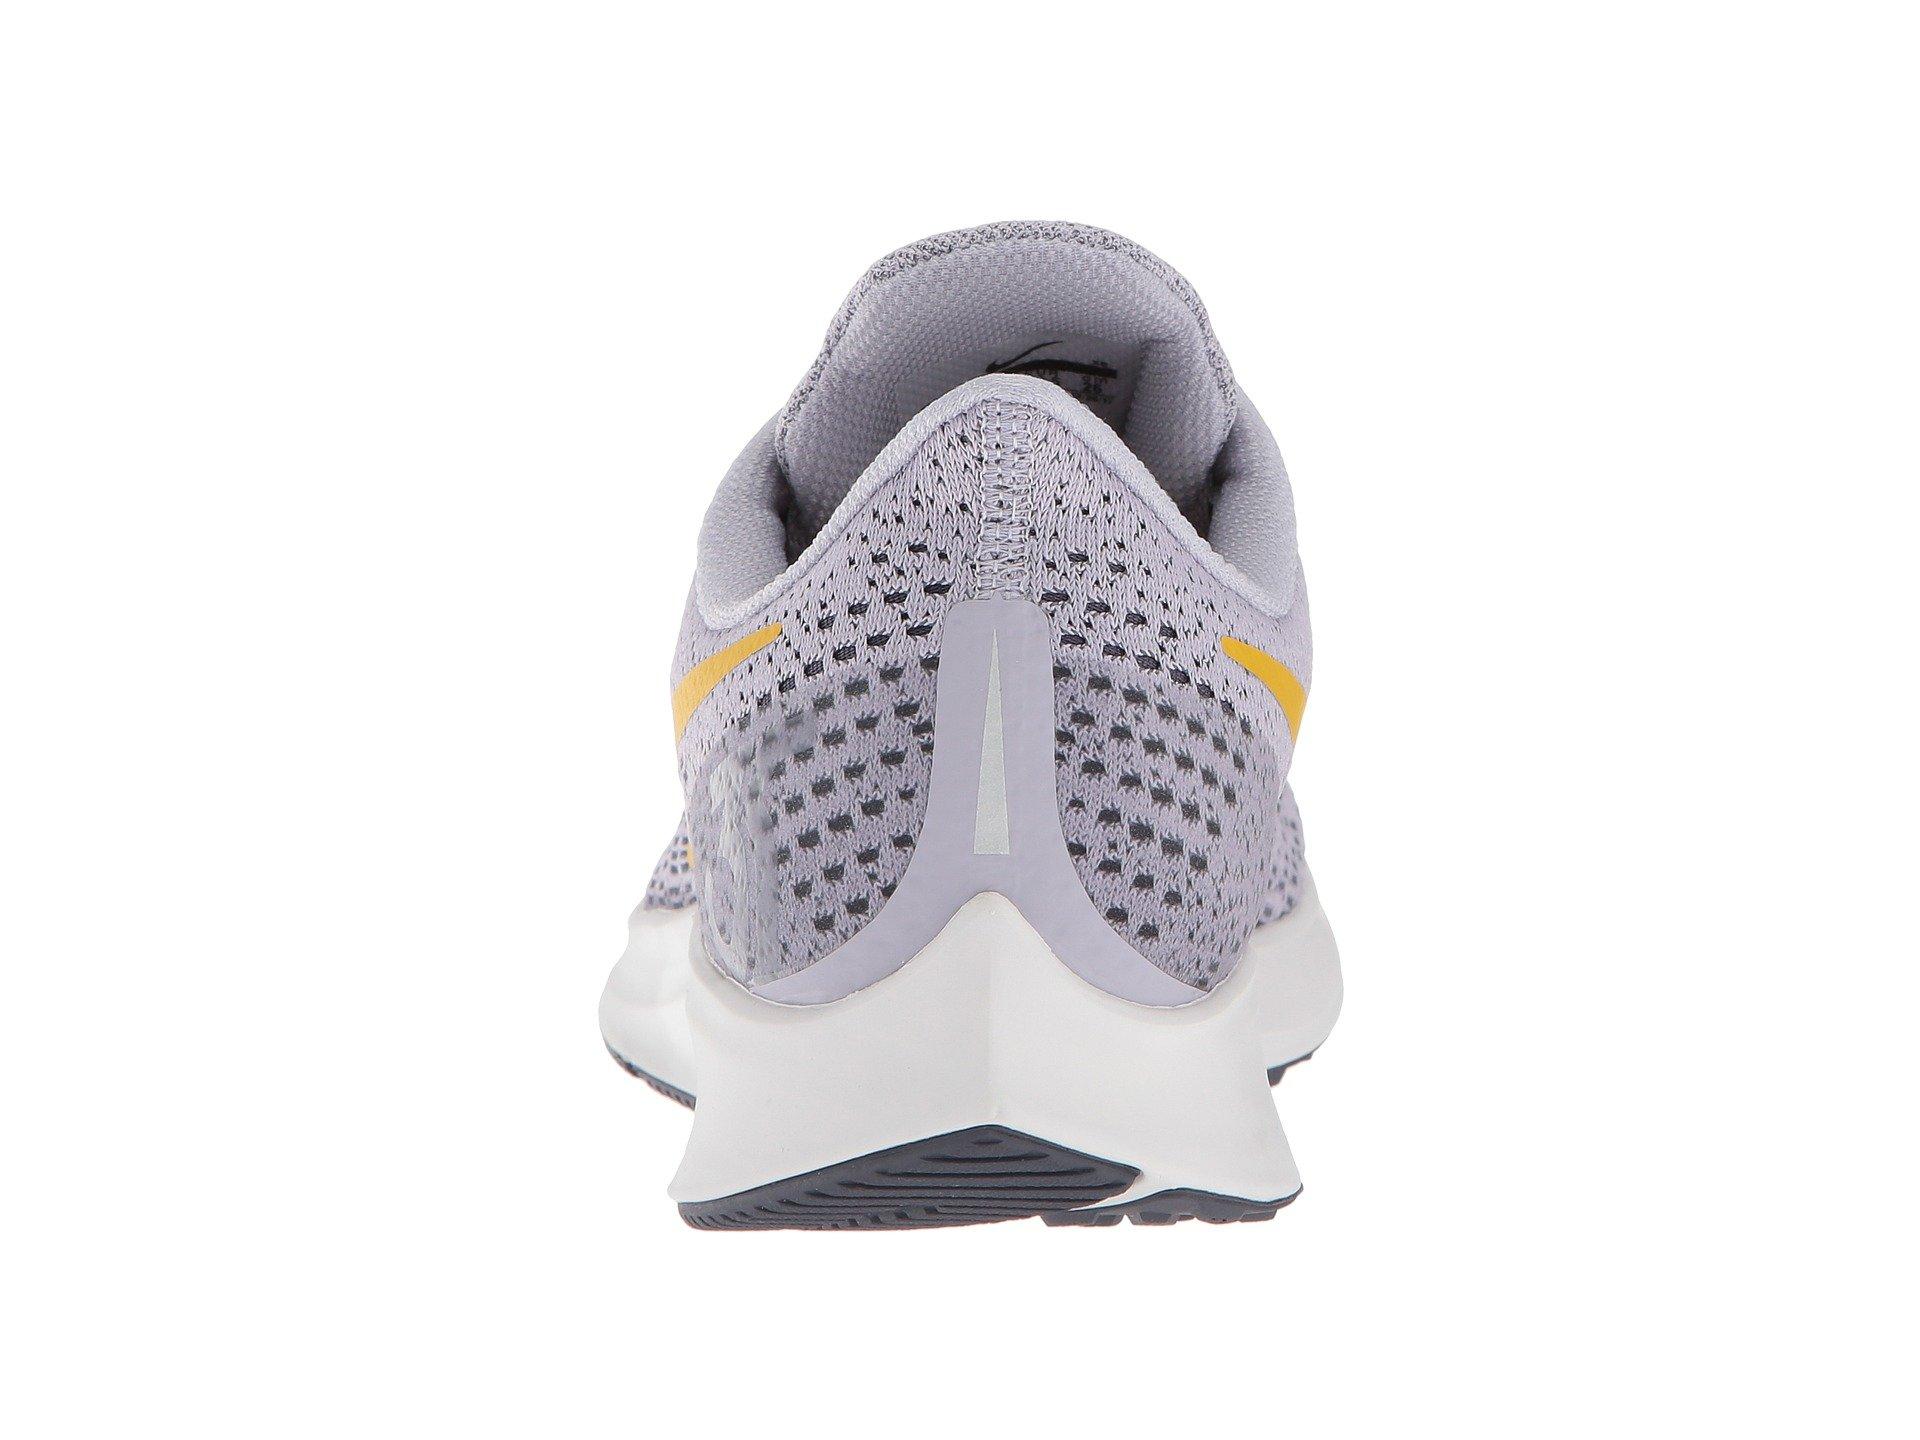 Nike WMNS Air Zoom Pegasus 35 Womens 942855-500 Size 5 by Nike (Image #3)